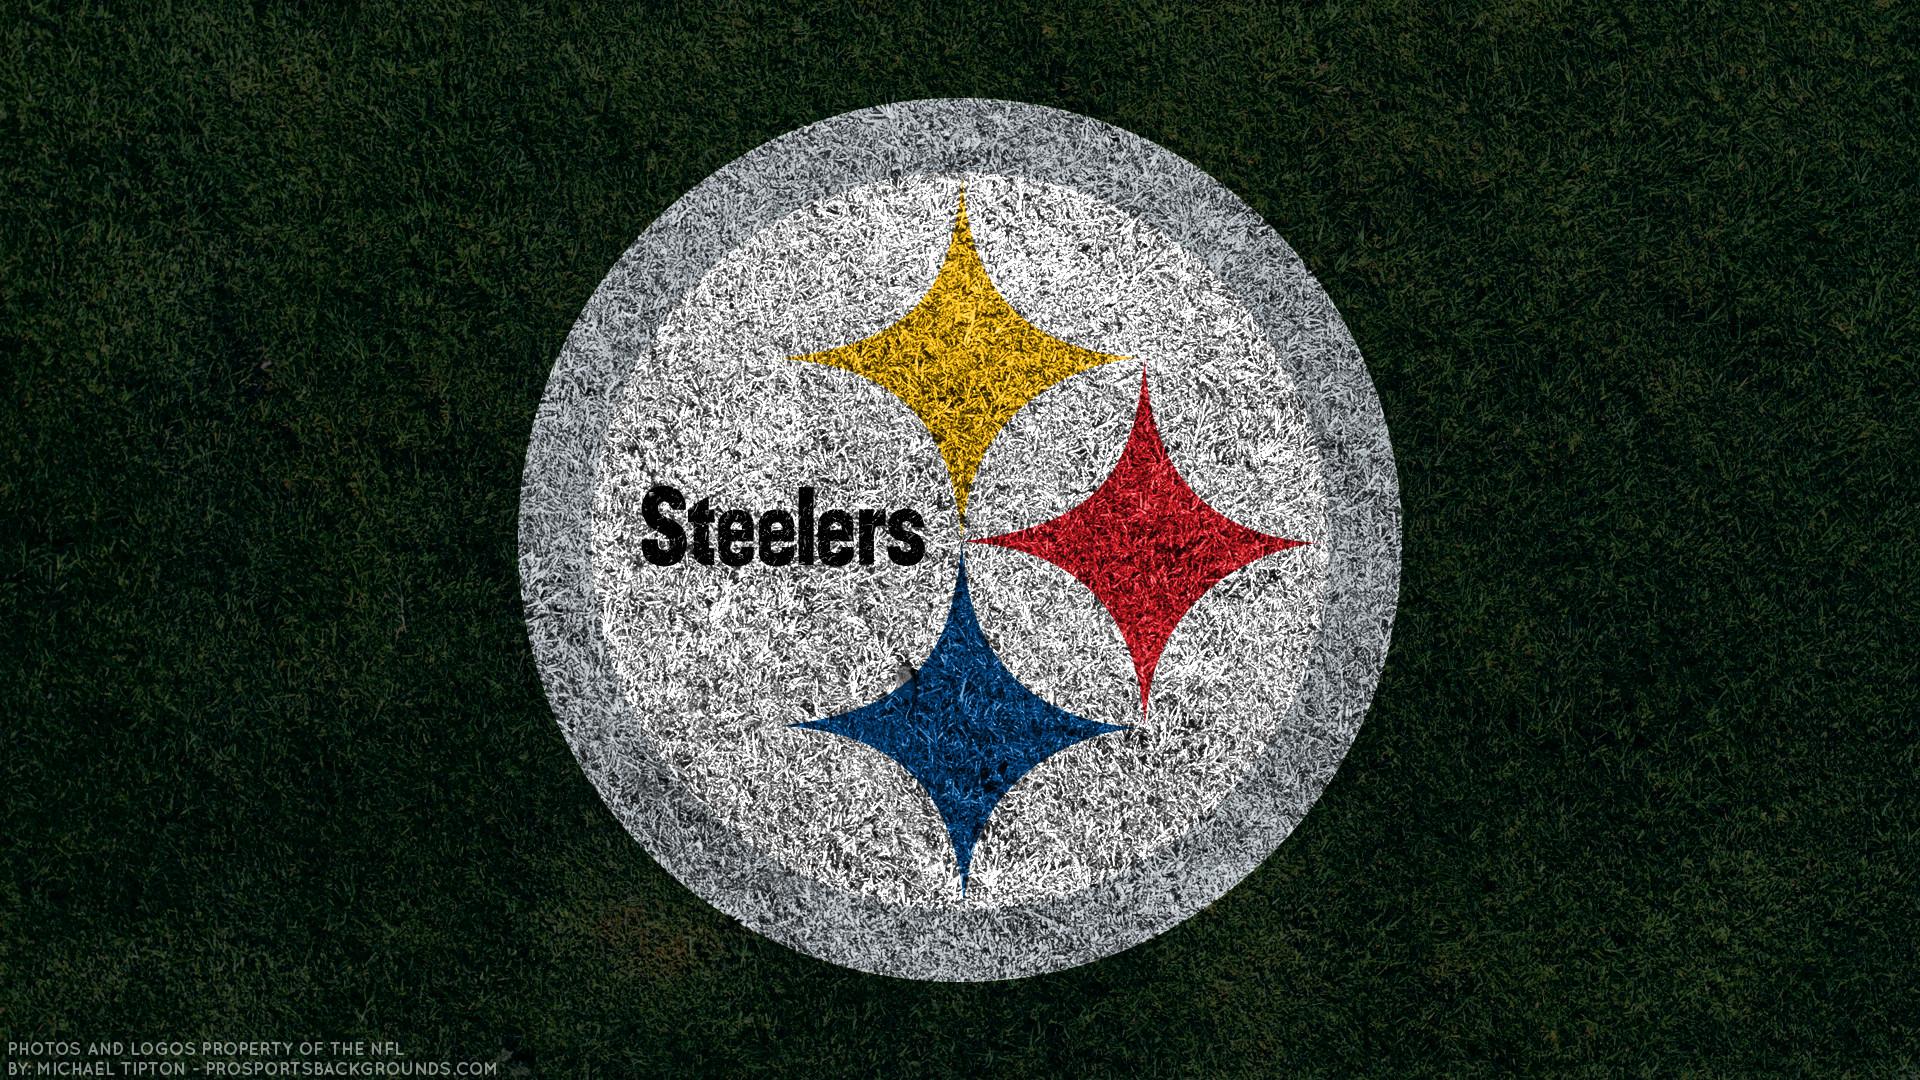 … Pittsburgh Steelers 2017 turf football logo wallpaper free pc desktop  computer